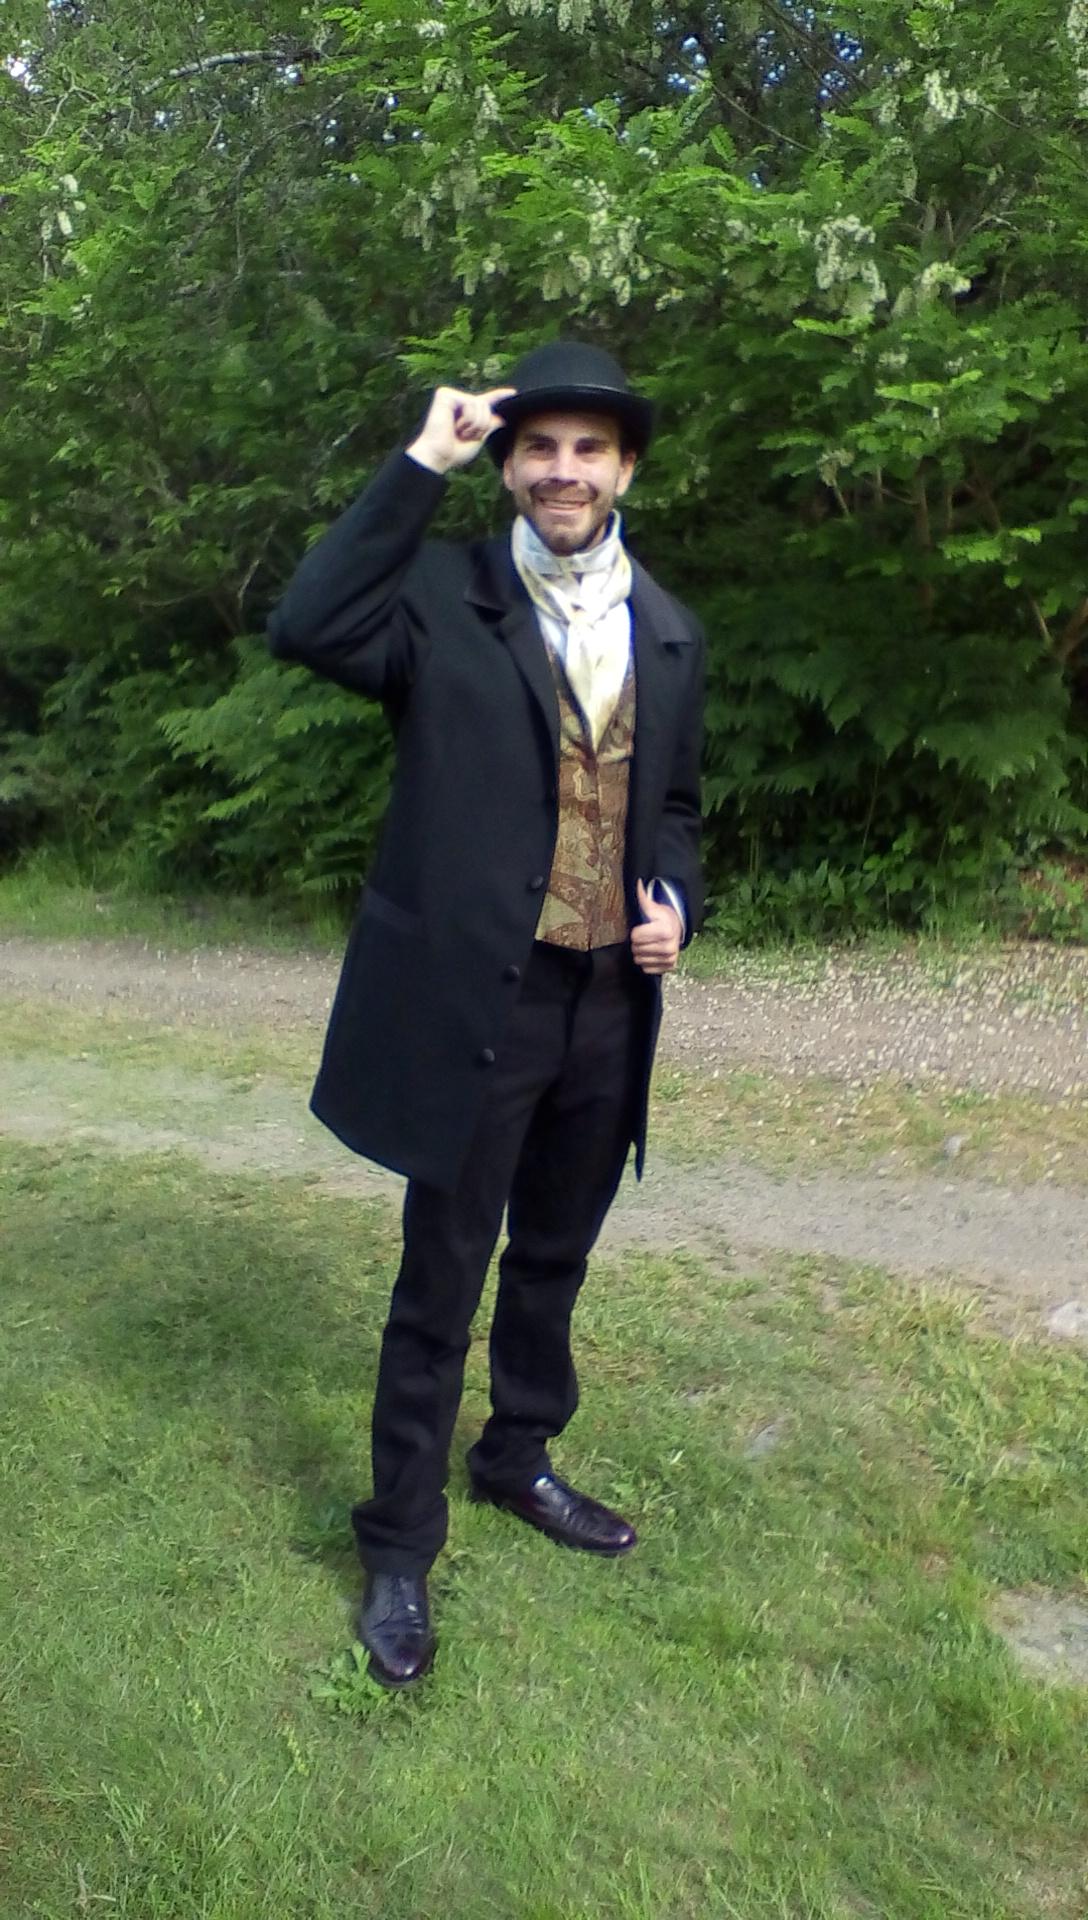 Dustin Jackson as Marcus